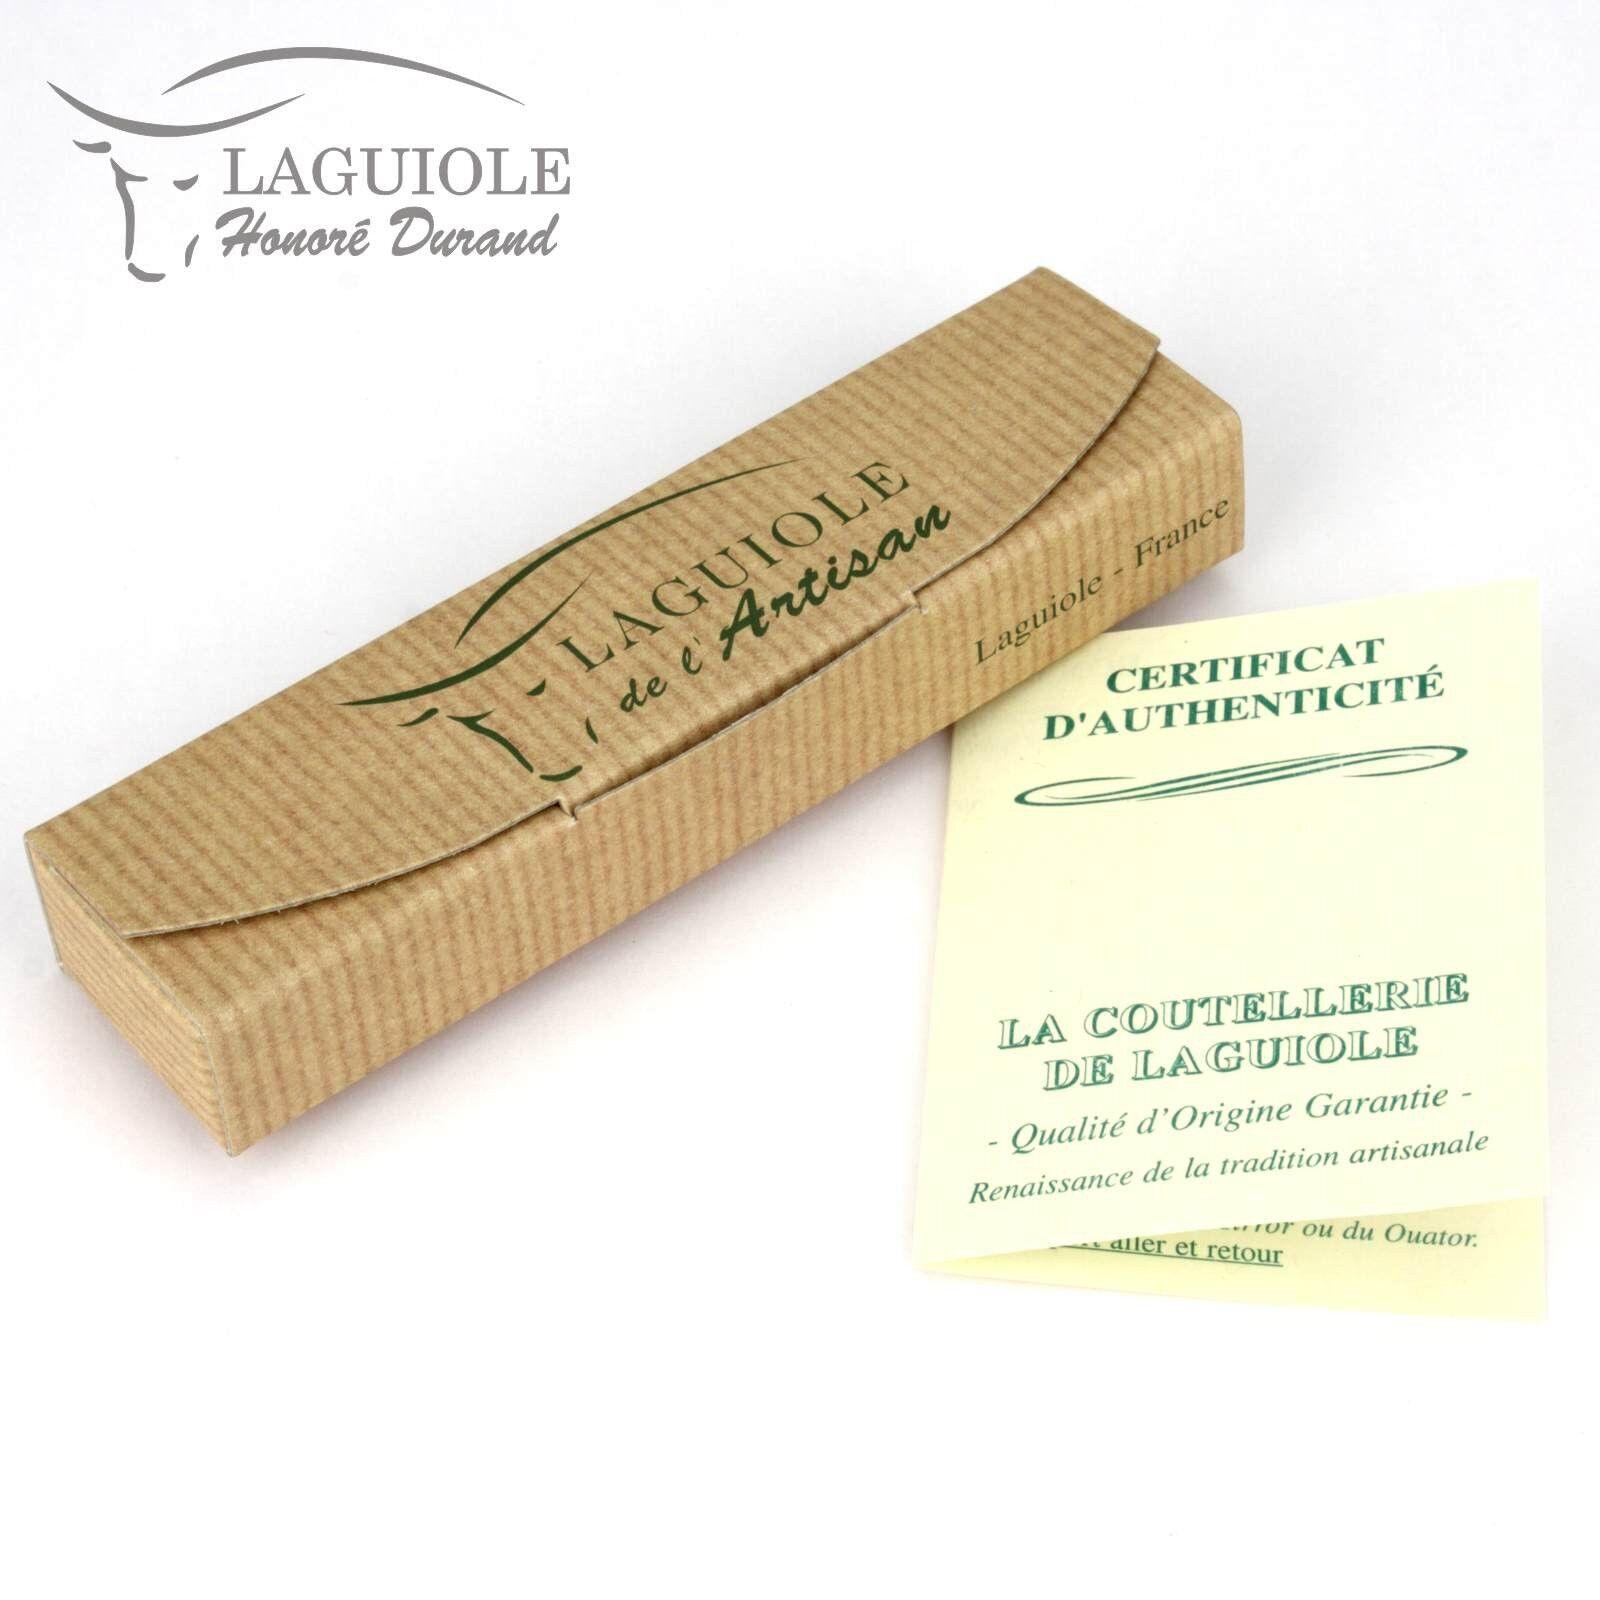 Laguiole Honoré Durand 12 cm cm cm Taschenmesser - Widderhorn - Messer Frankreich 7fabde